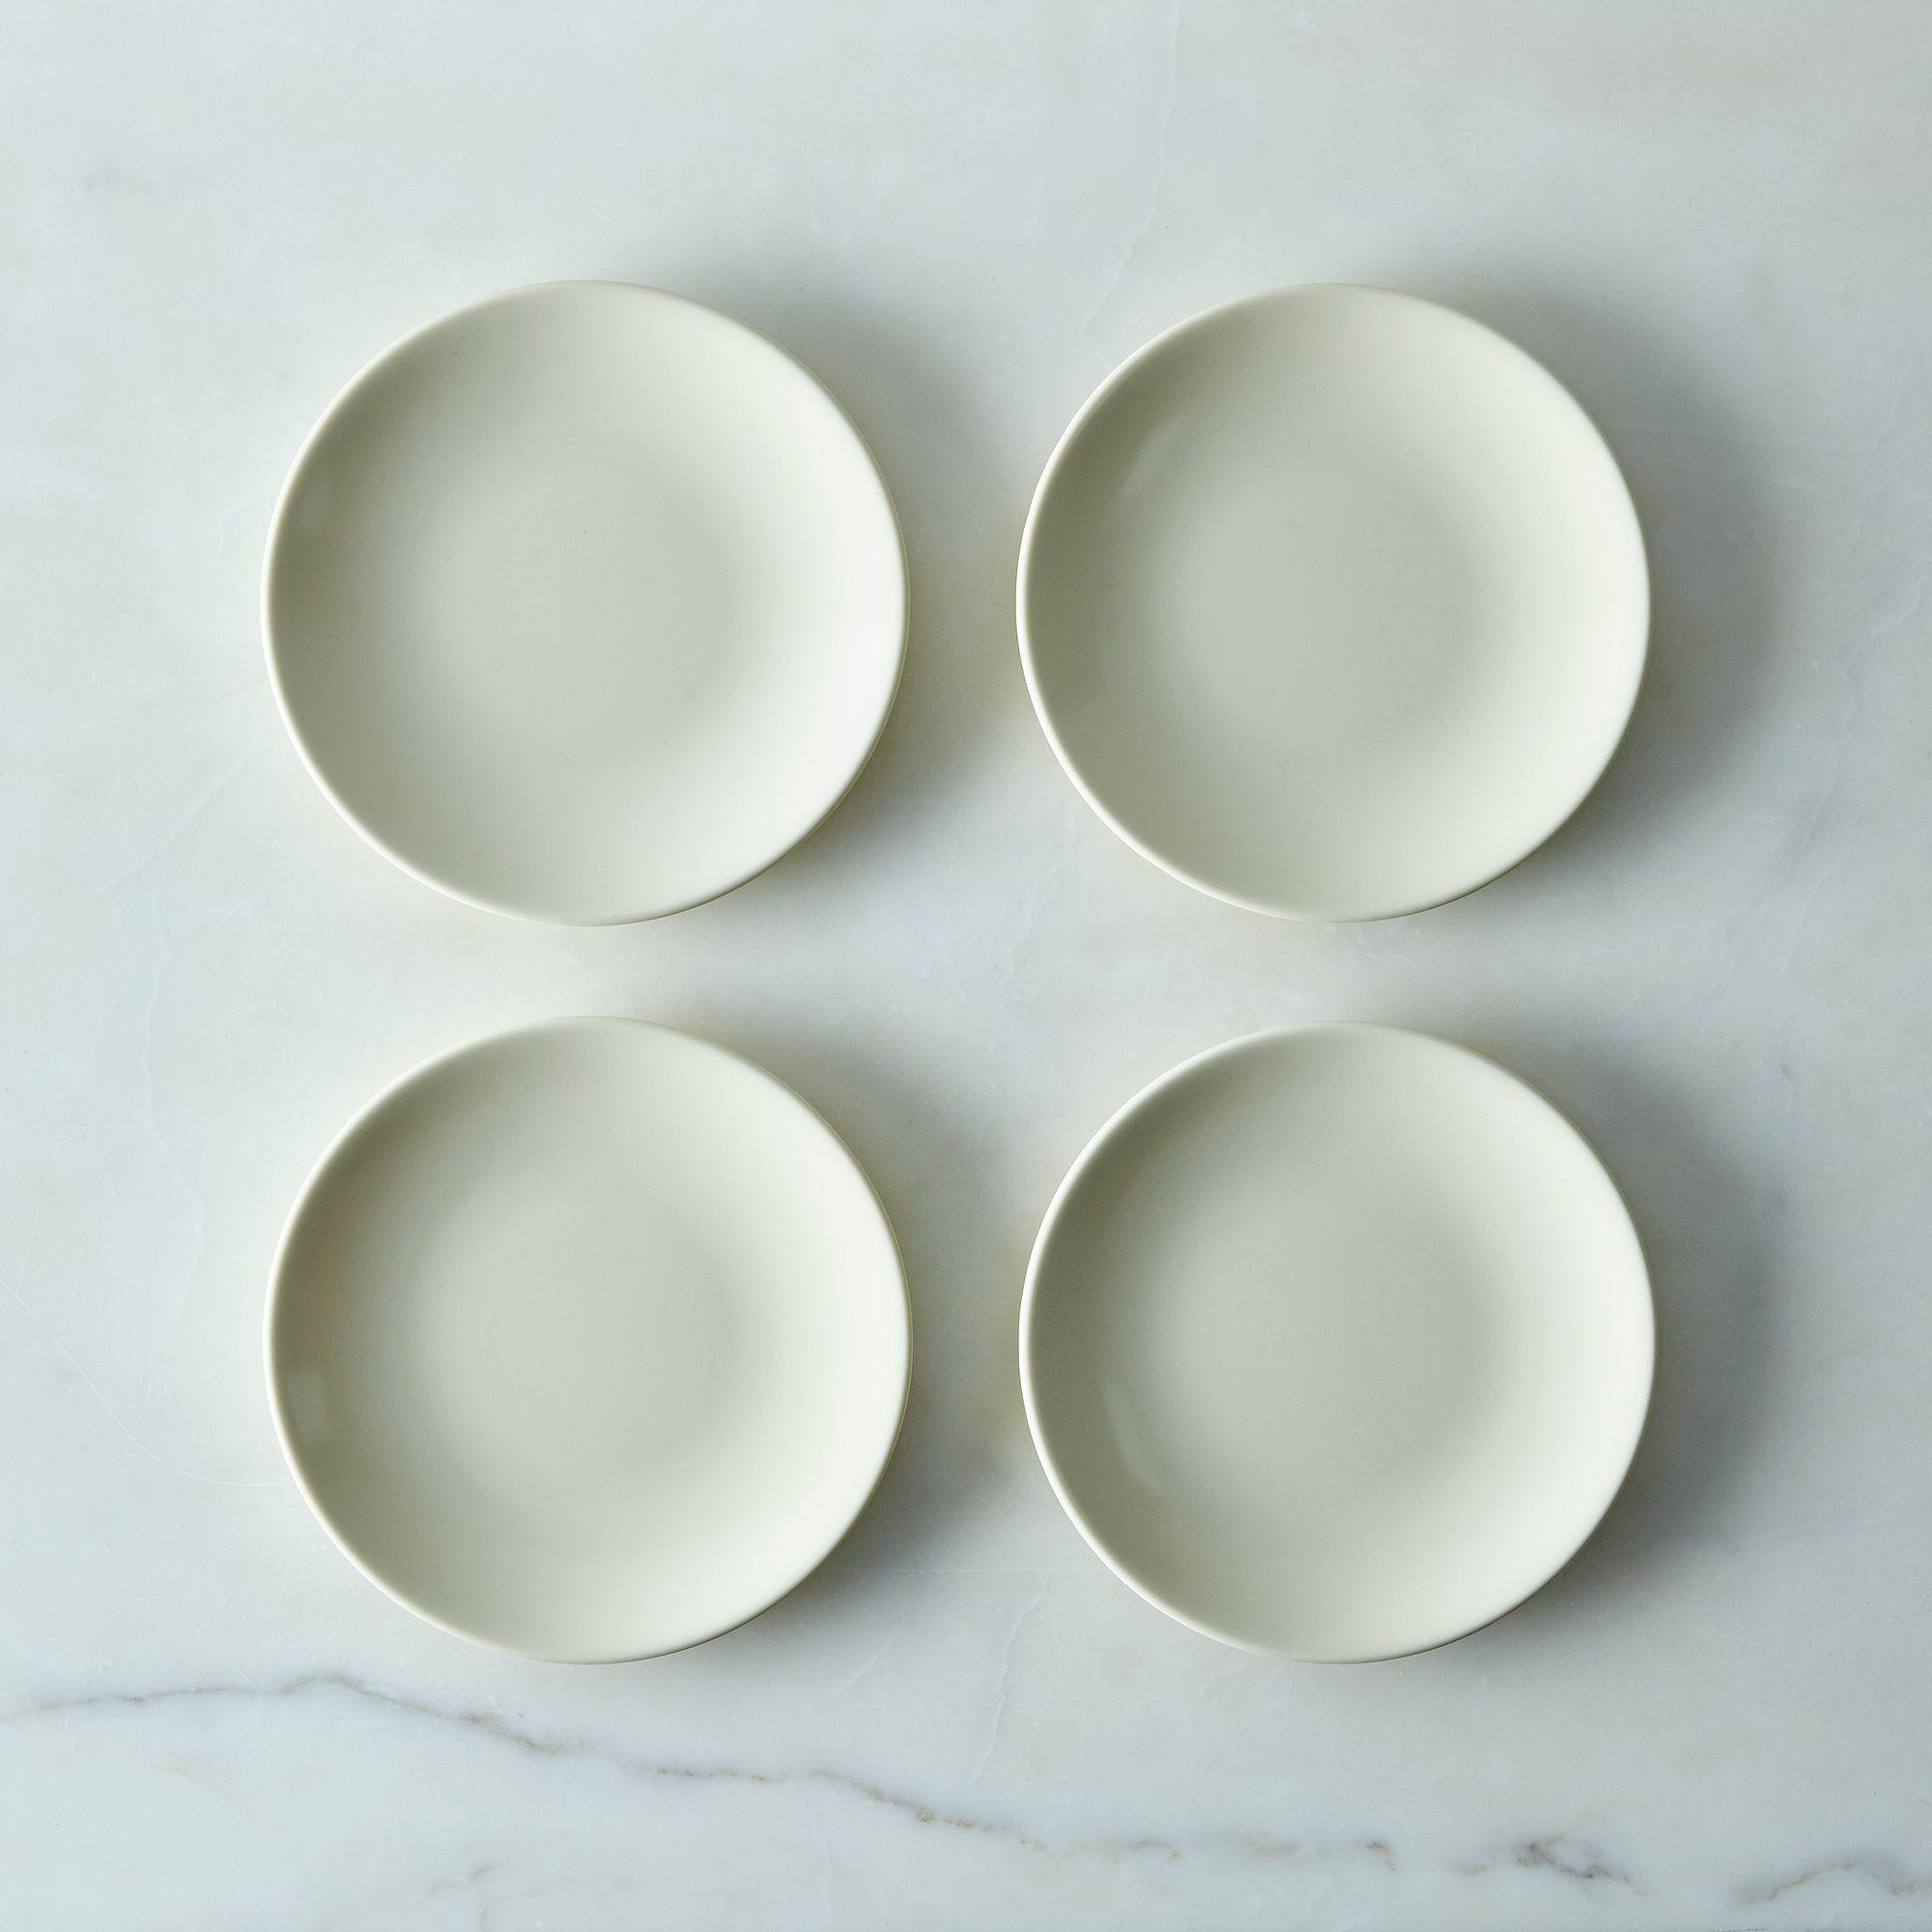 Russel Wright Melamine Dinnerware & Serveware Bone, Salad Plates (set Of 4)